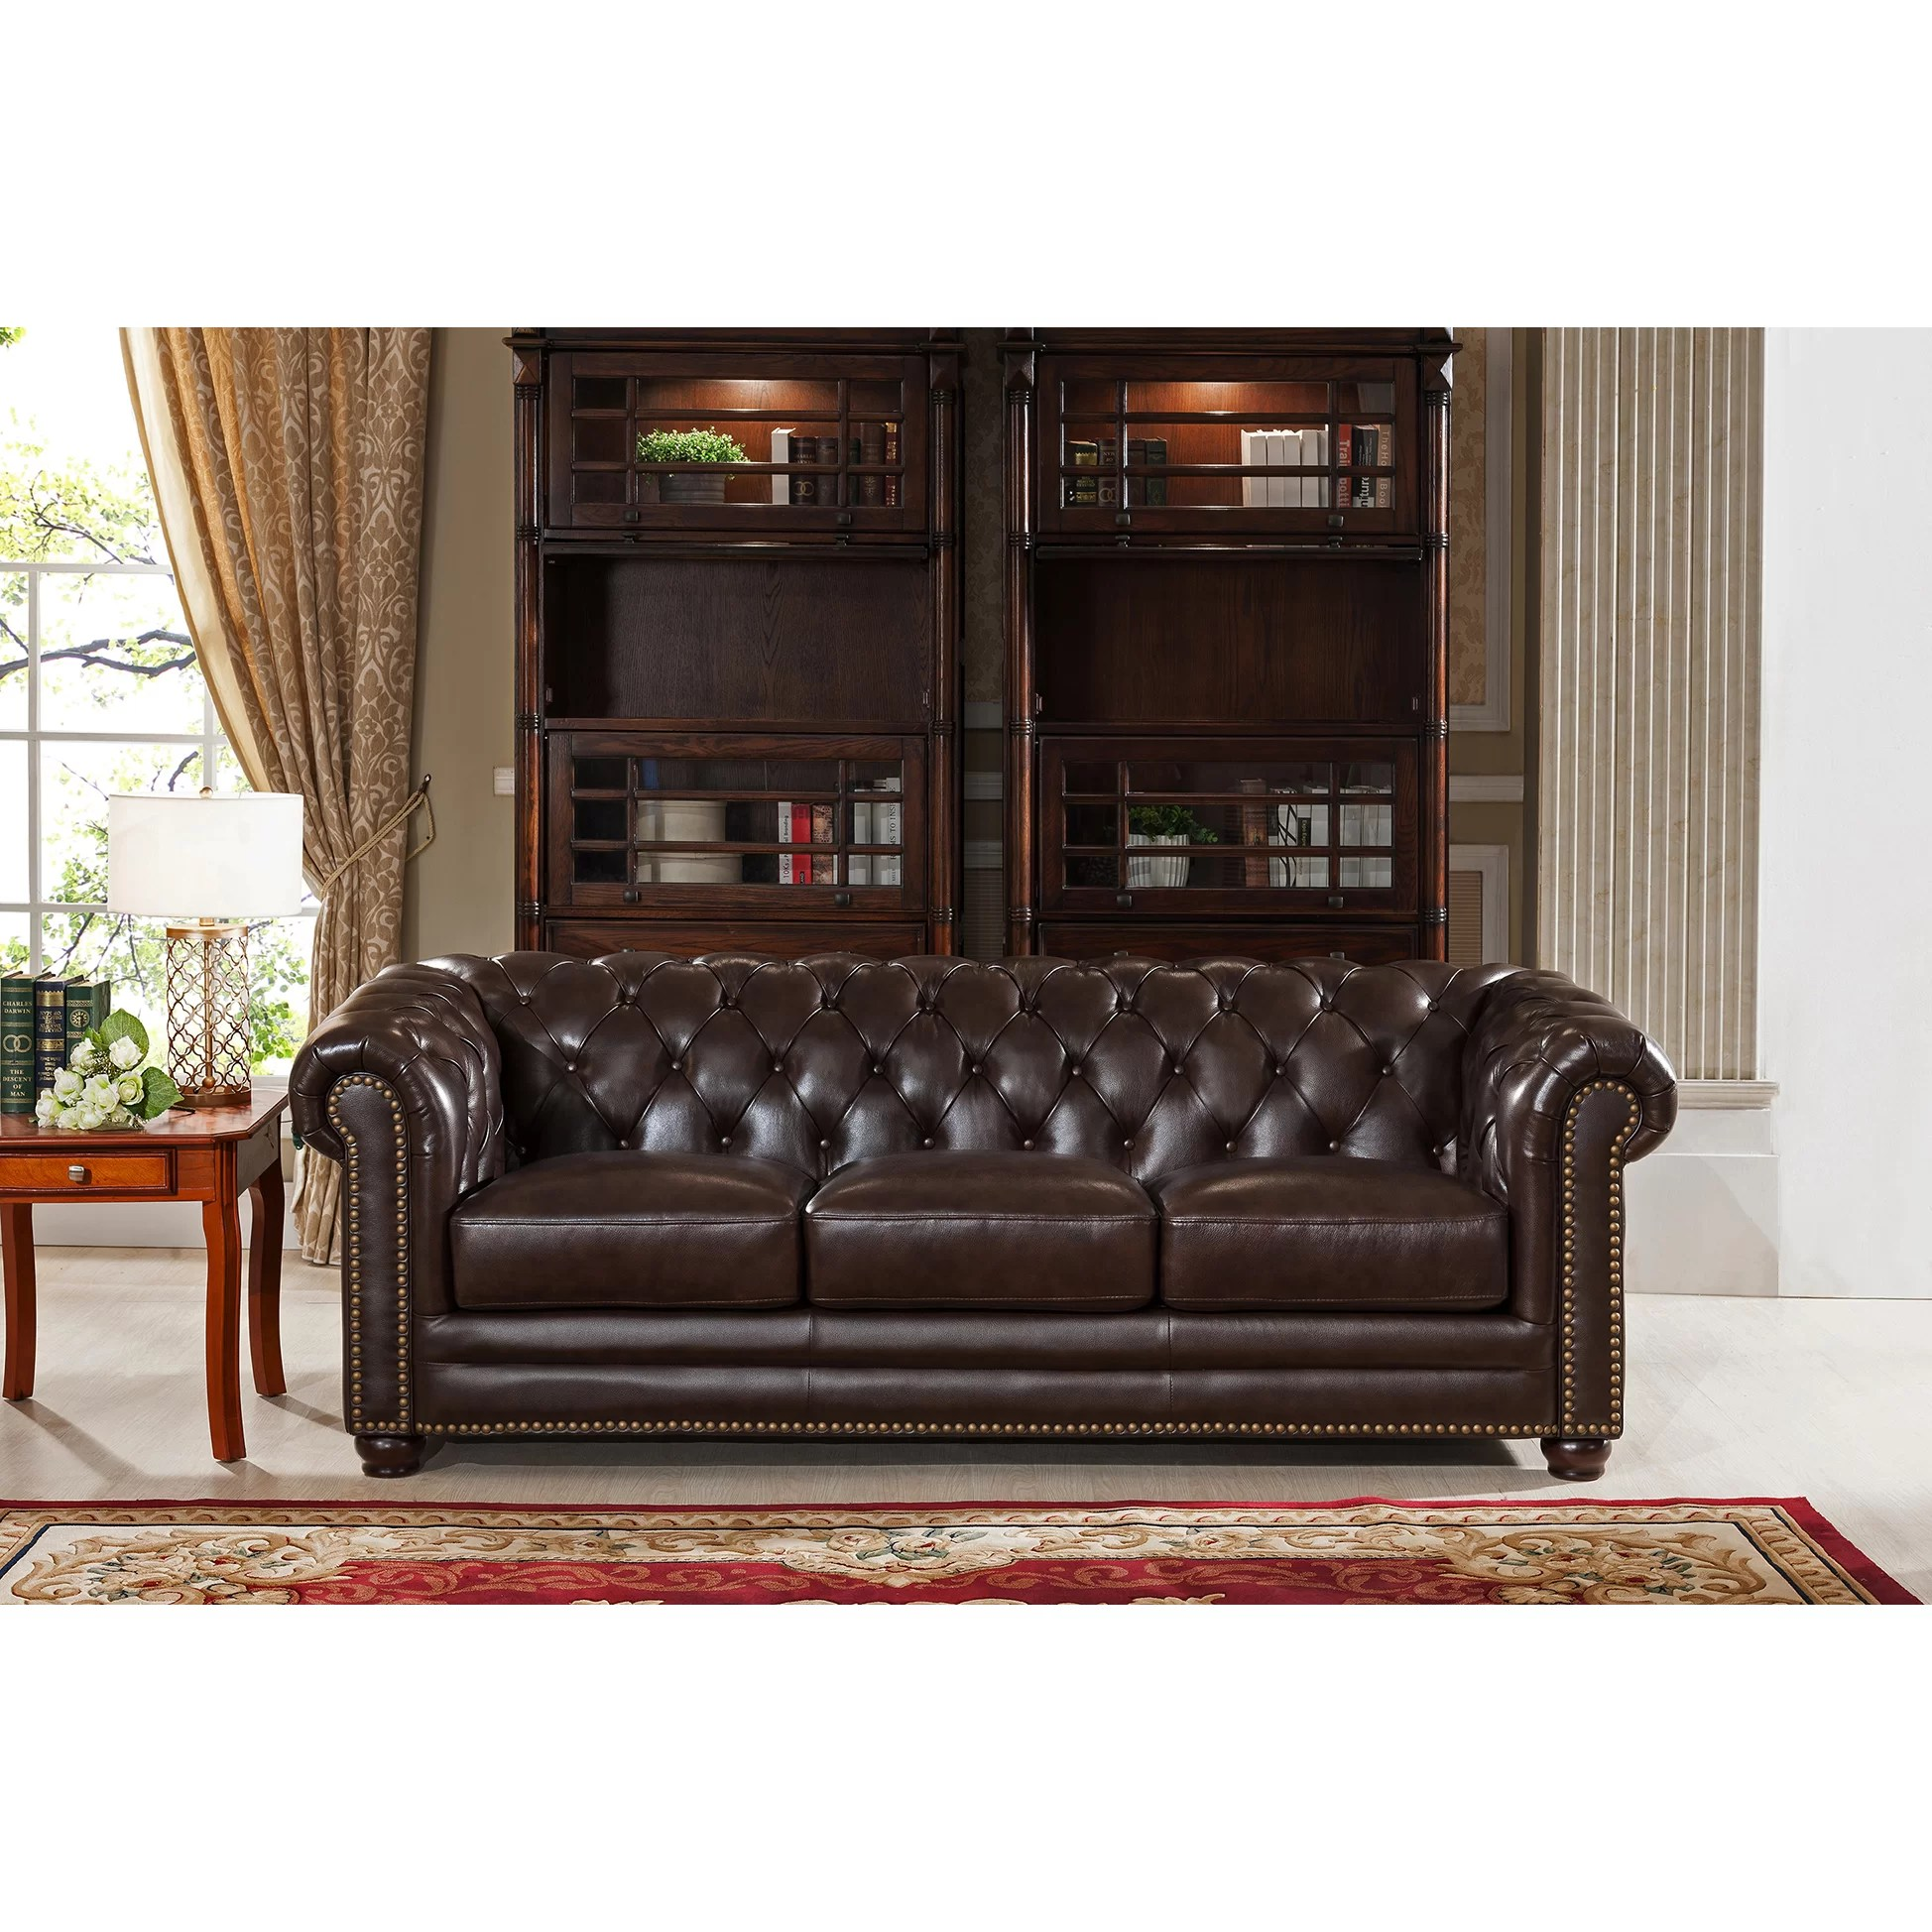 kensington leather chair la z boy office amax top grain chesterfield sofa and